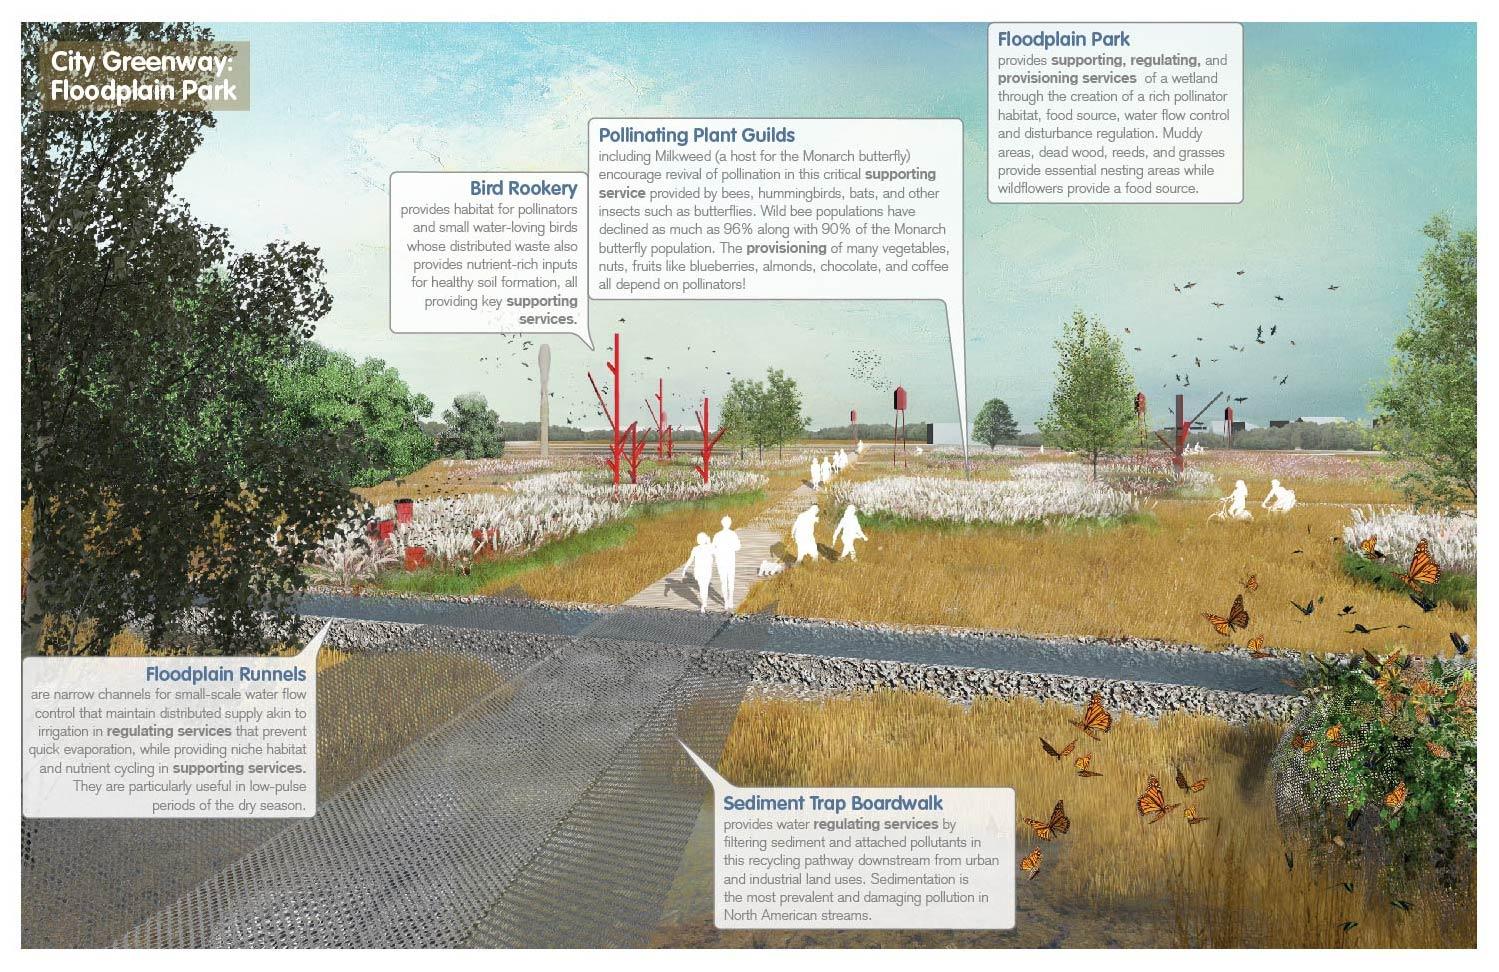 Floodplain Park: is a wetland that provides rich pollinator habitat and water flow control. University of Arkansas Community Design Center